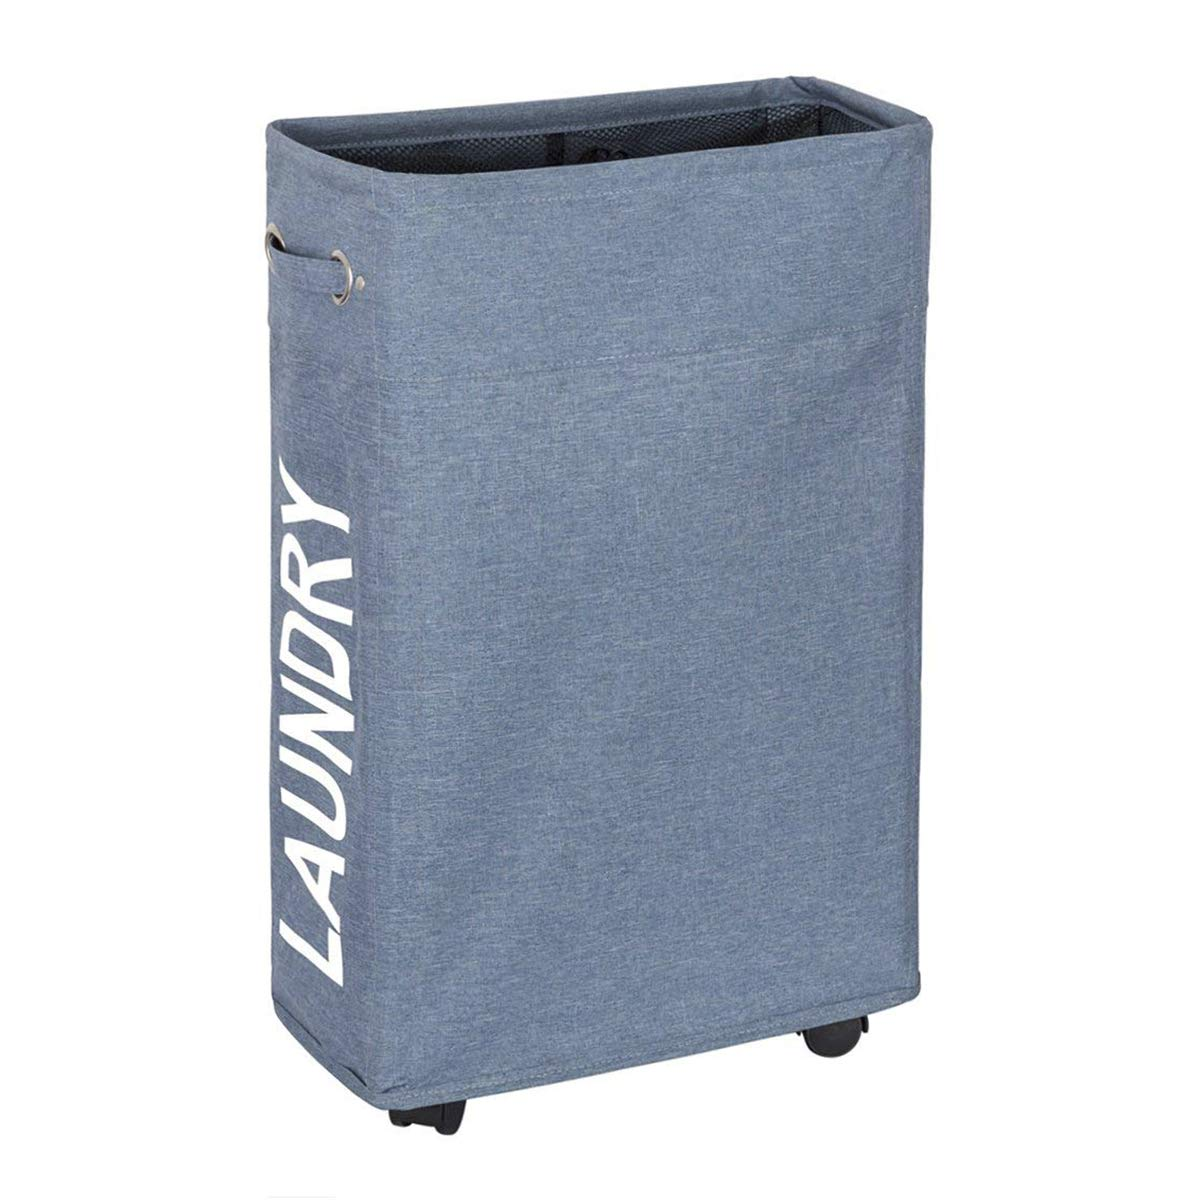 WISHPOOL Slim Rolling Laundry Hamper Foldable Laundry Basket with Handle on Wheels 15.4X7.8X22 Inch(Blue)